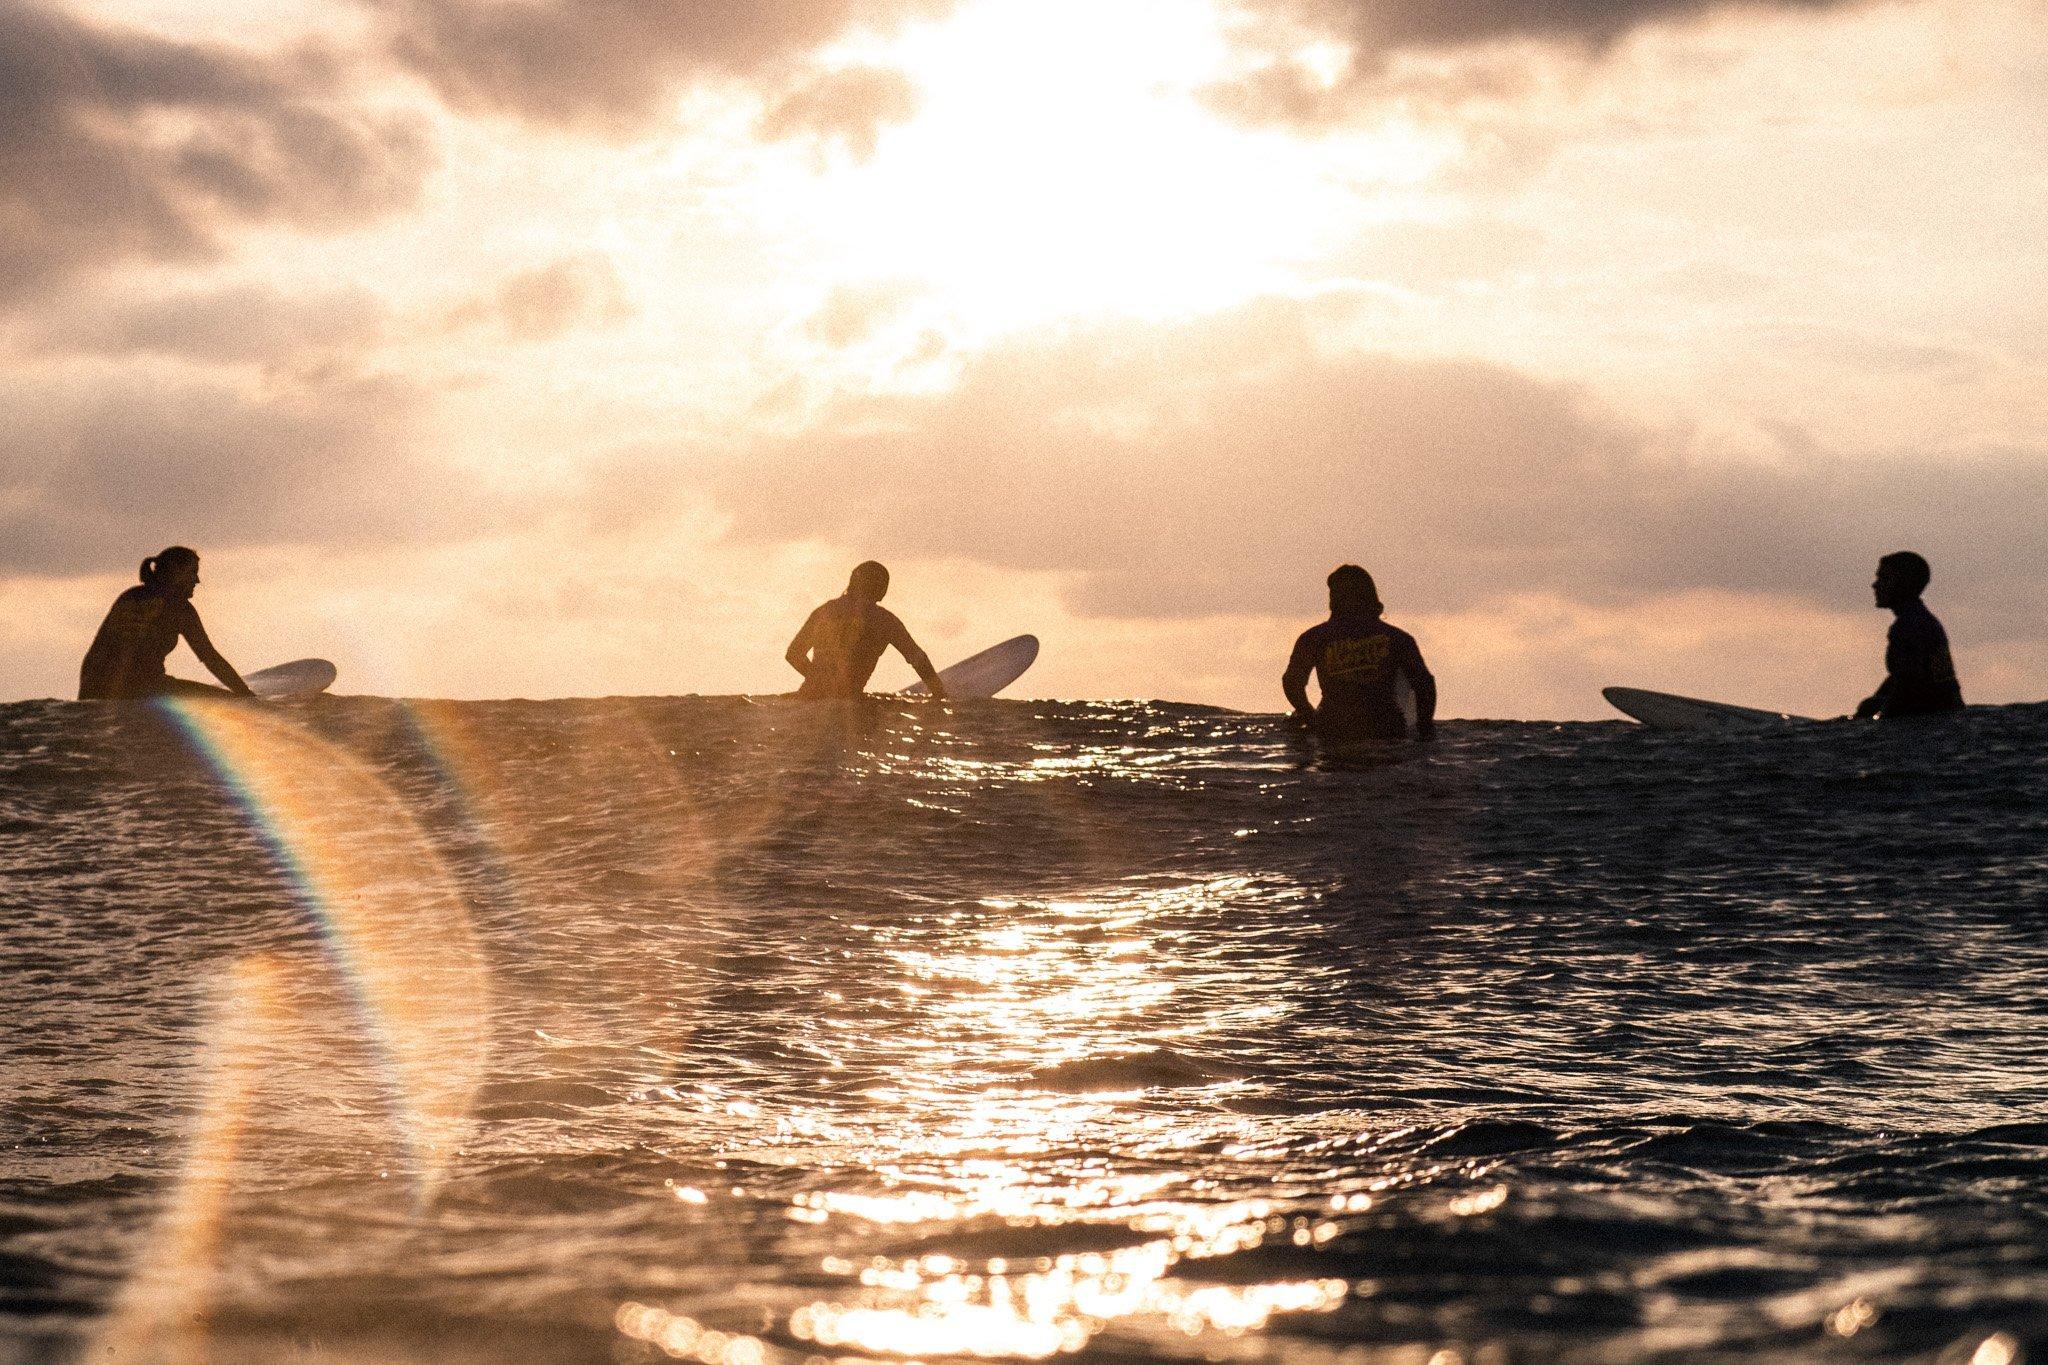 Women on waves 4 surfers enjoying a sunset session